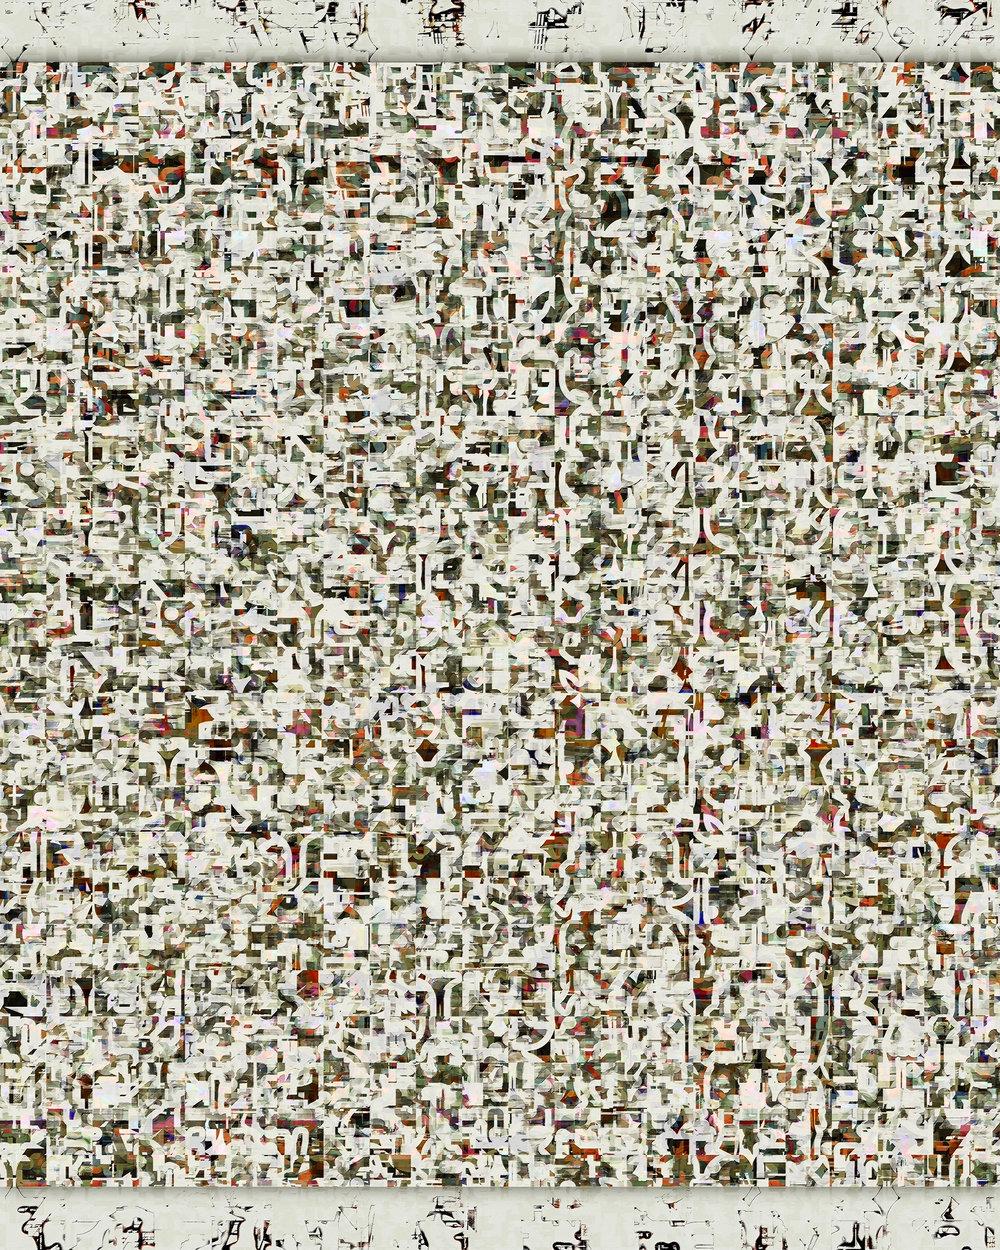 190409 Multiverse Suburb